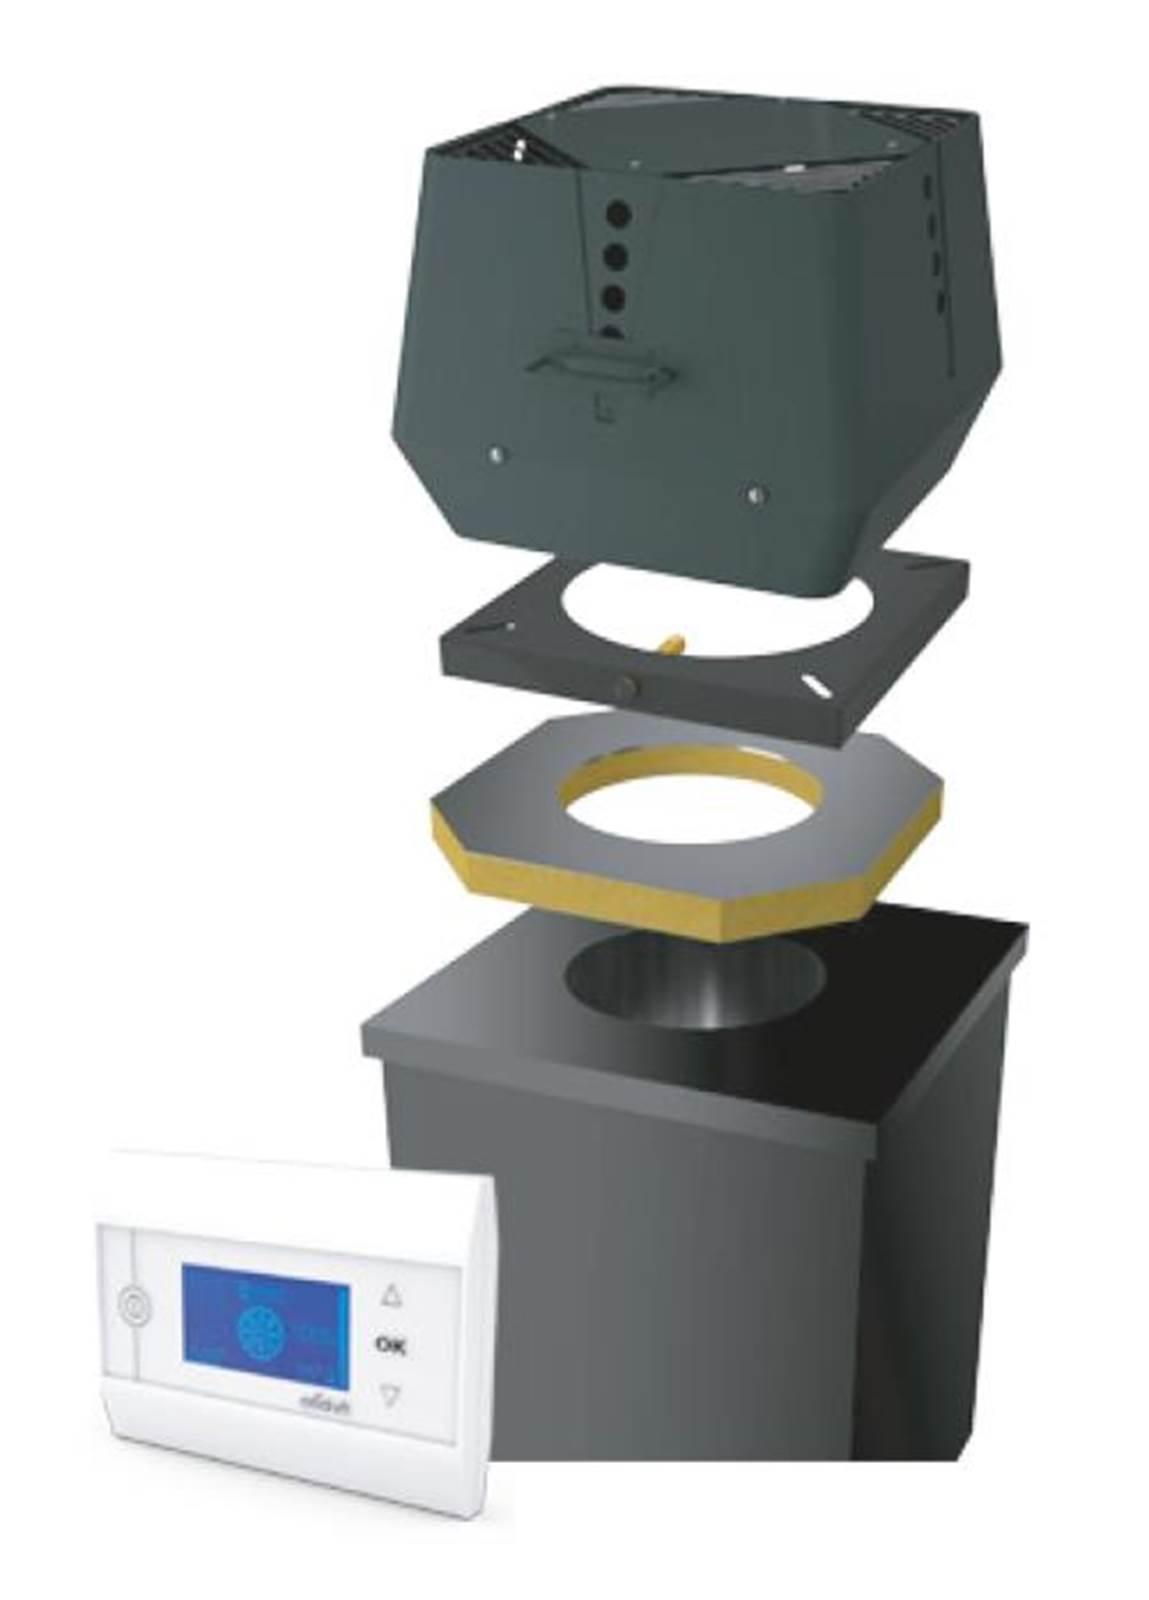 Exodraft røyksugerpakke 2 RSV-009 / EW 41